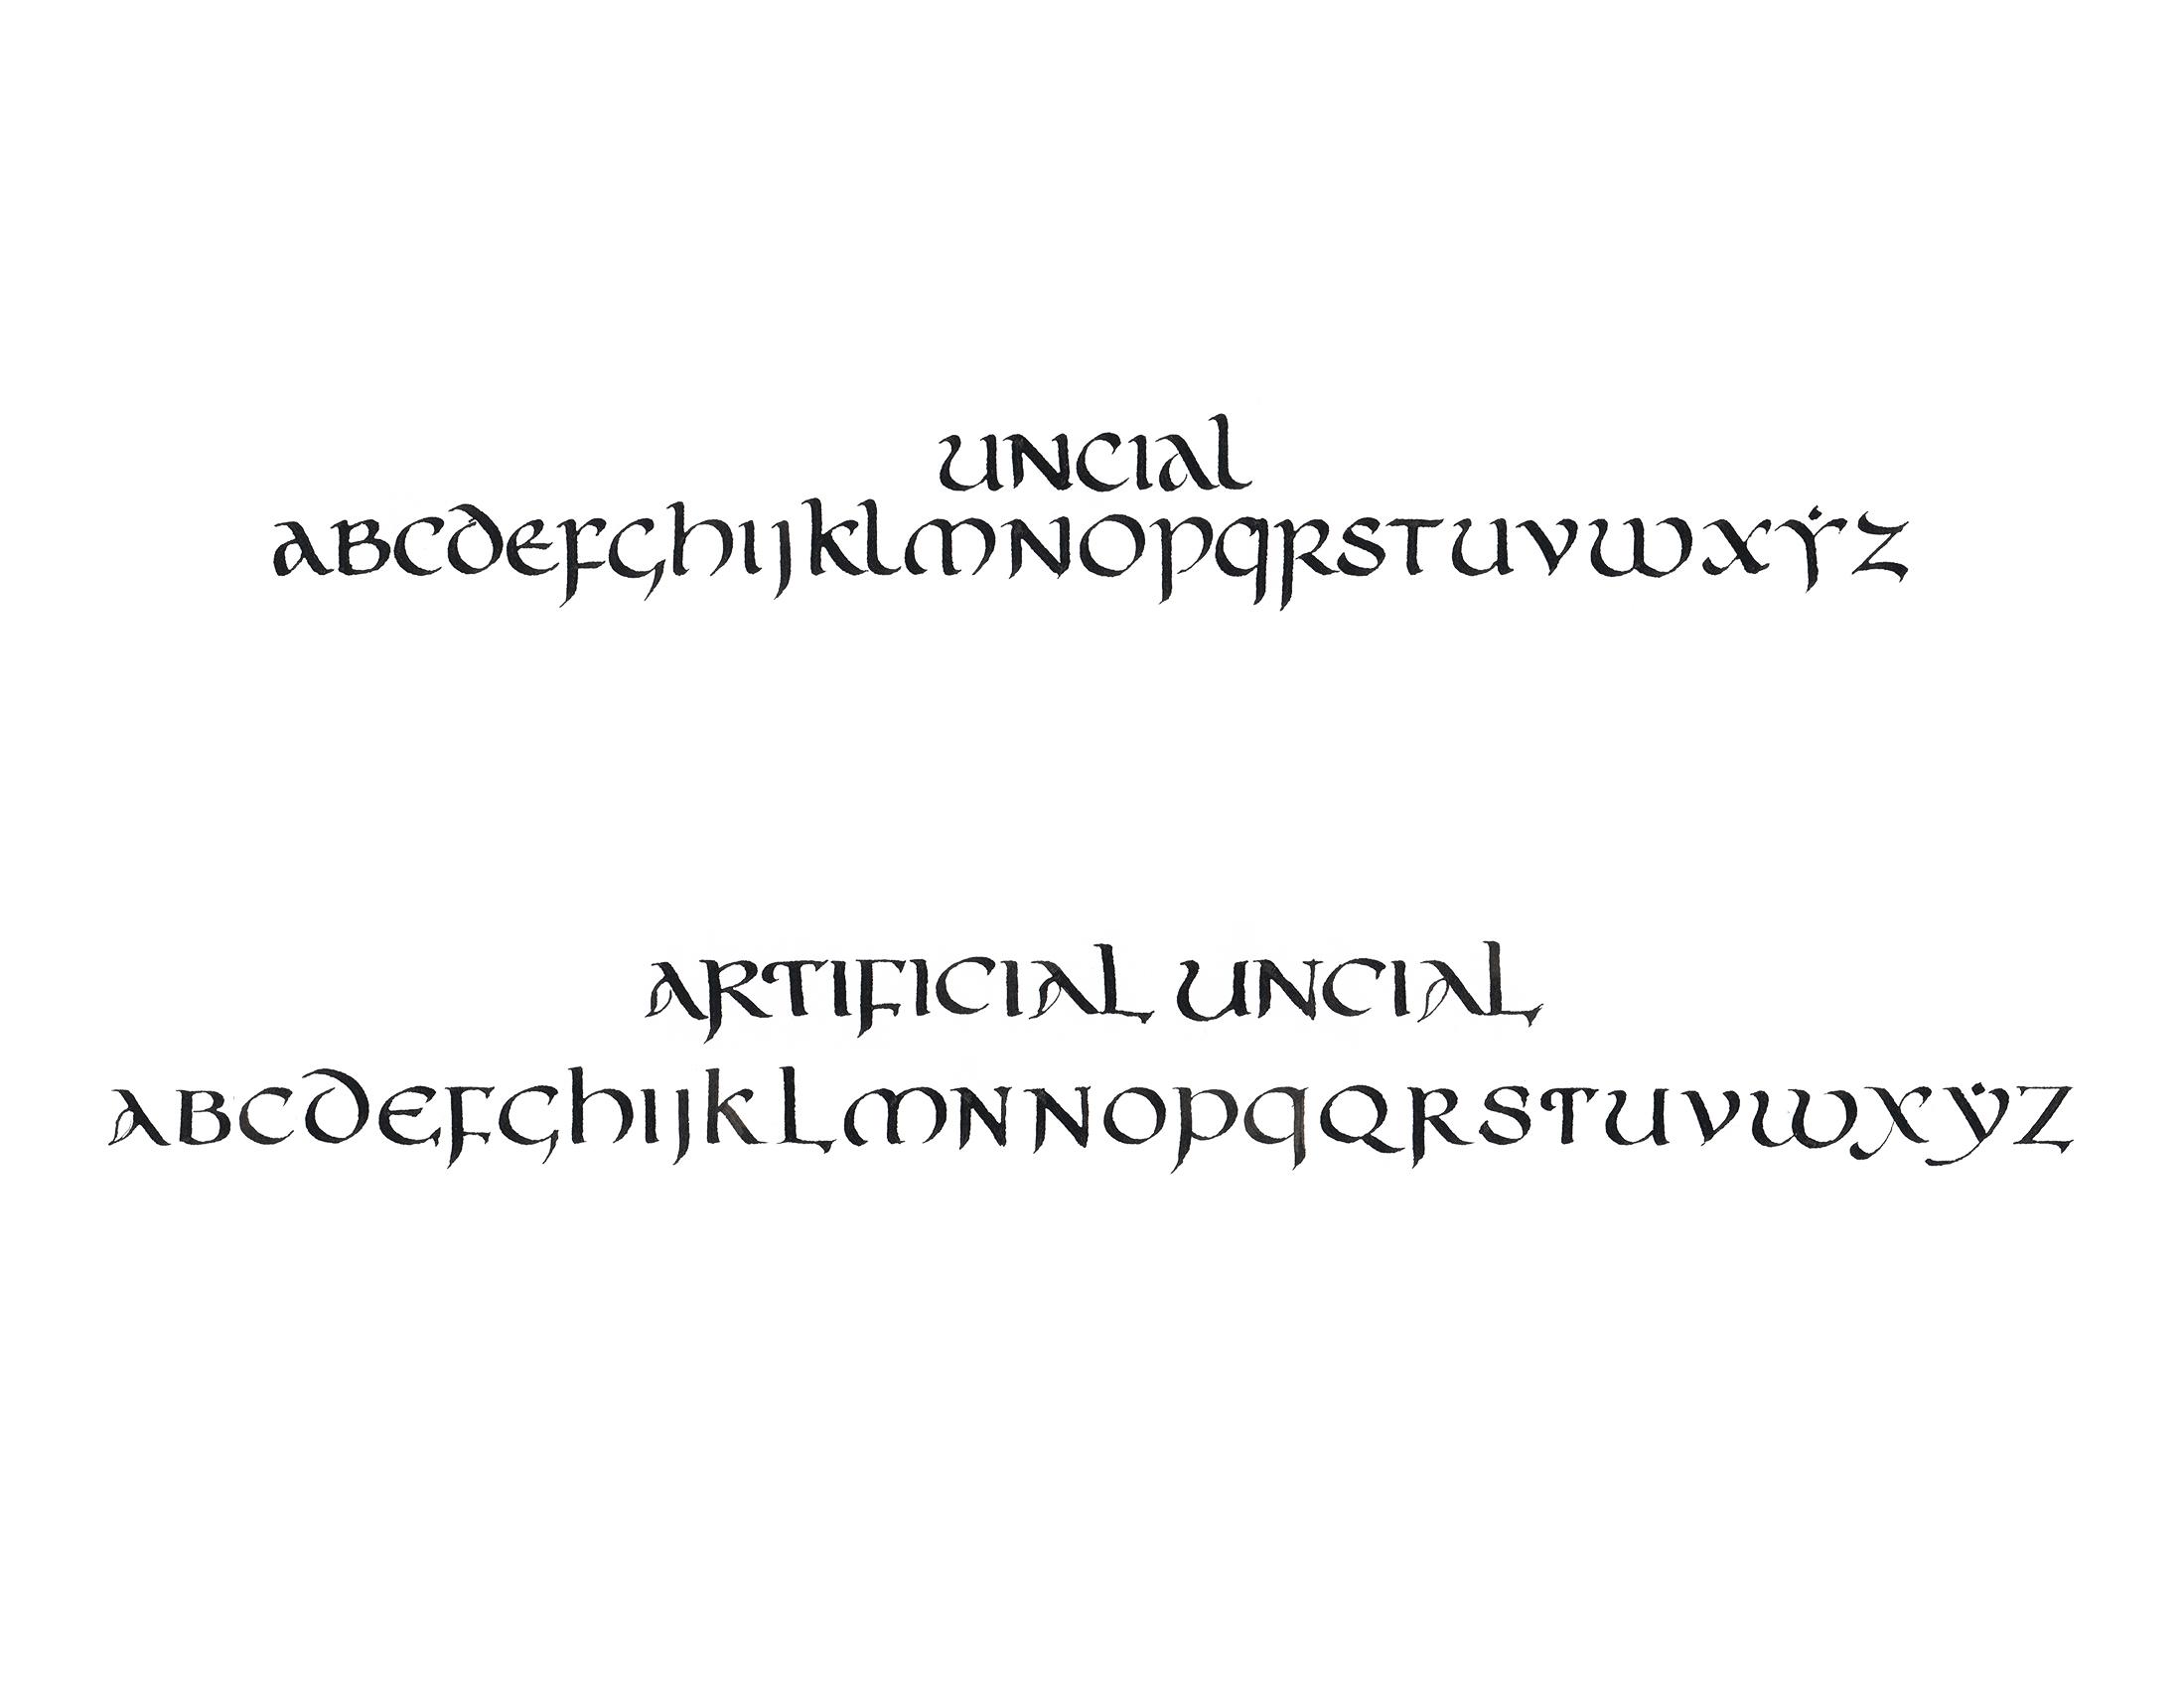 Uncial Variations